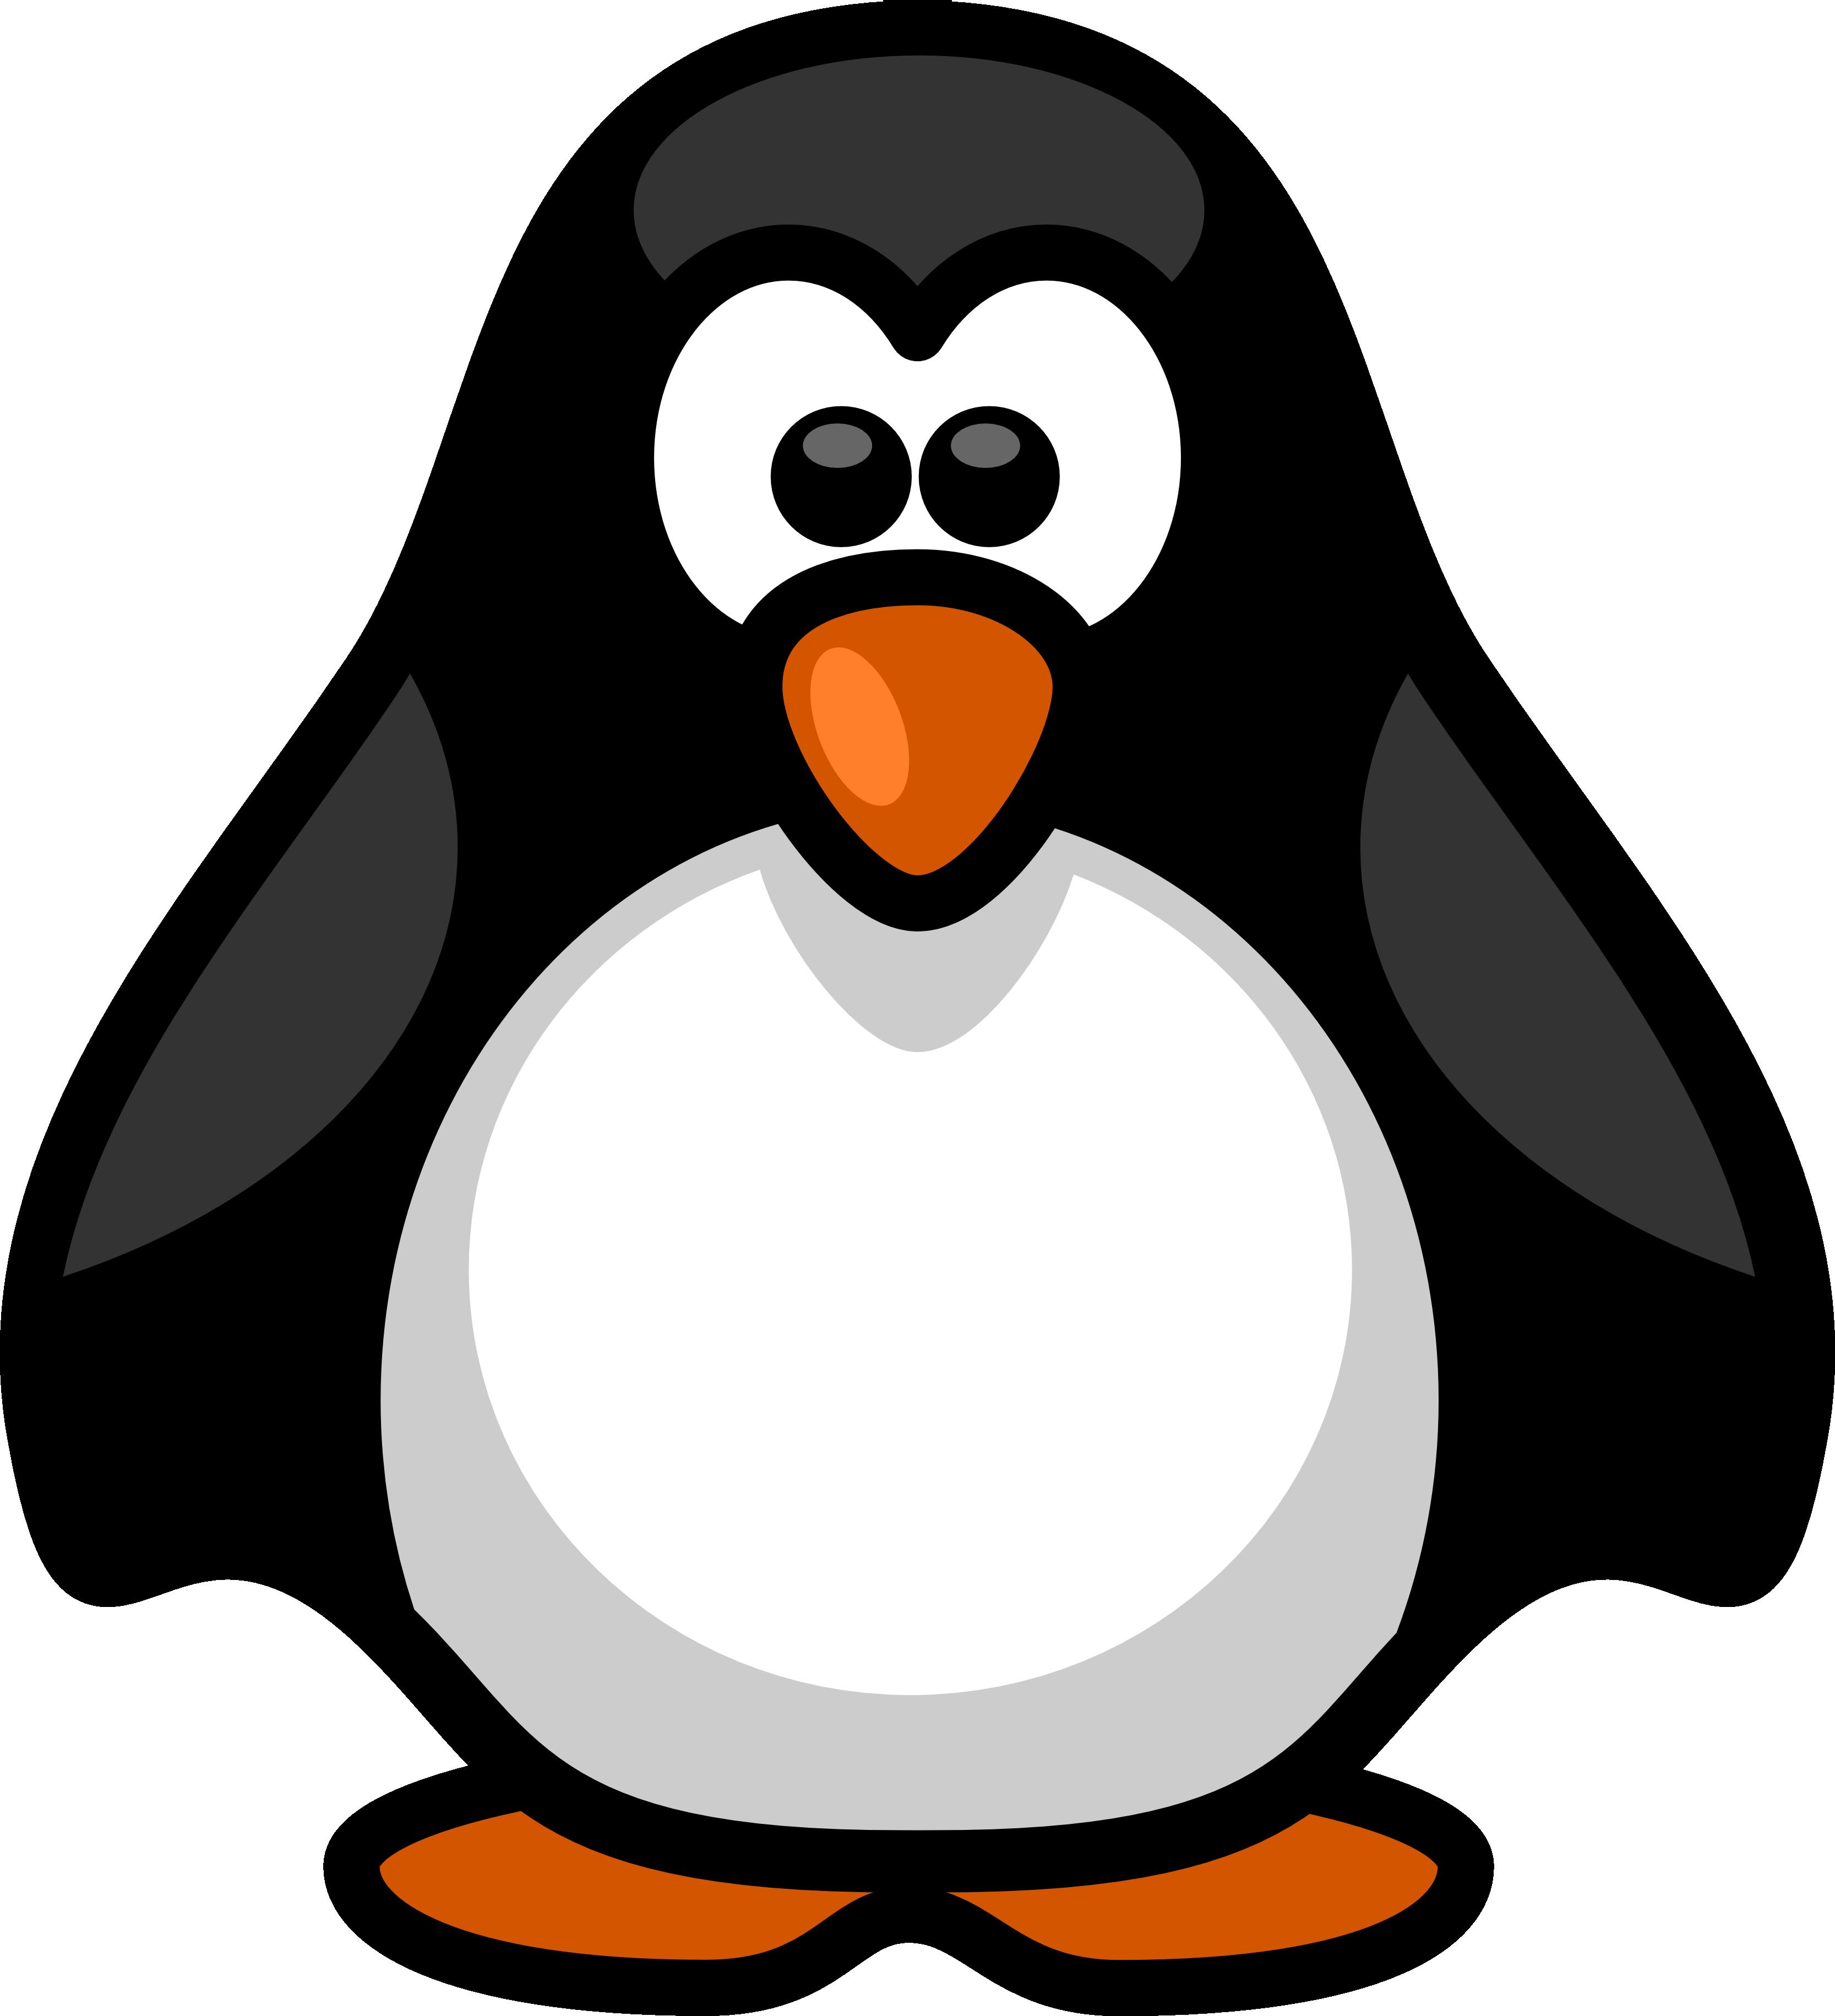 Penguin clipart transparent background Panda Penguin Santa Free Penguin